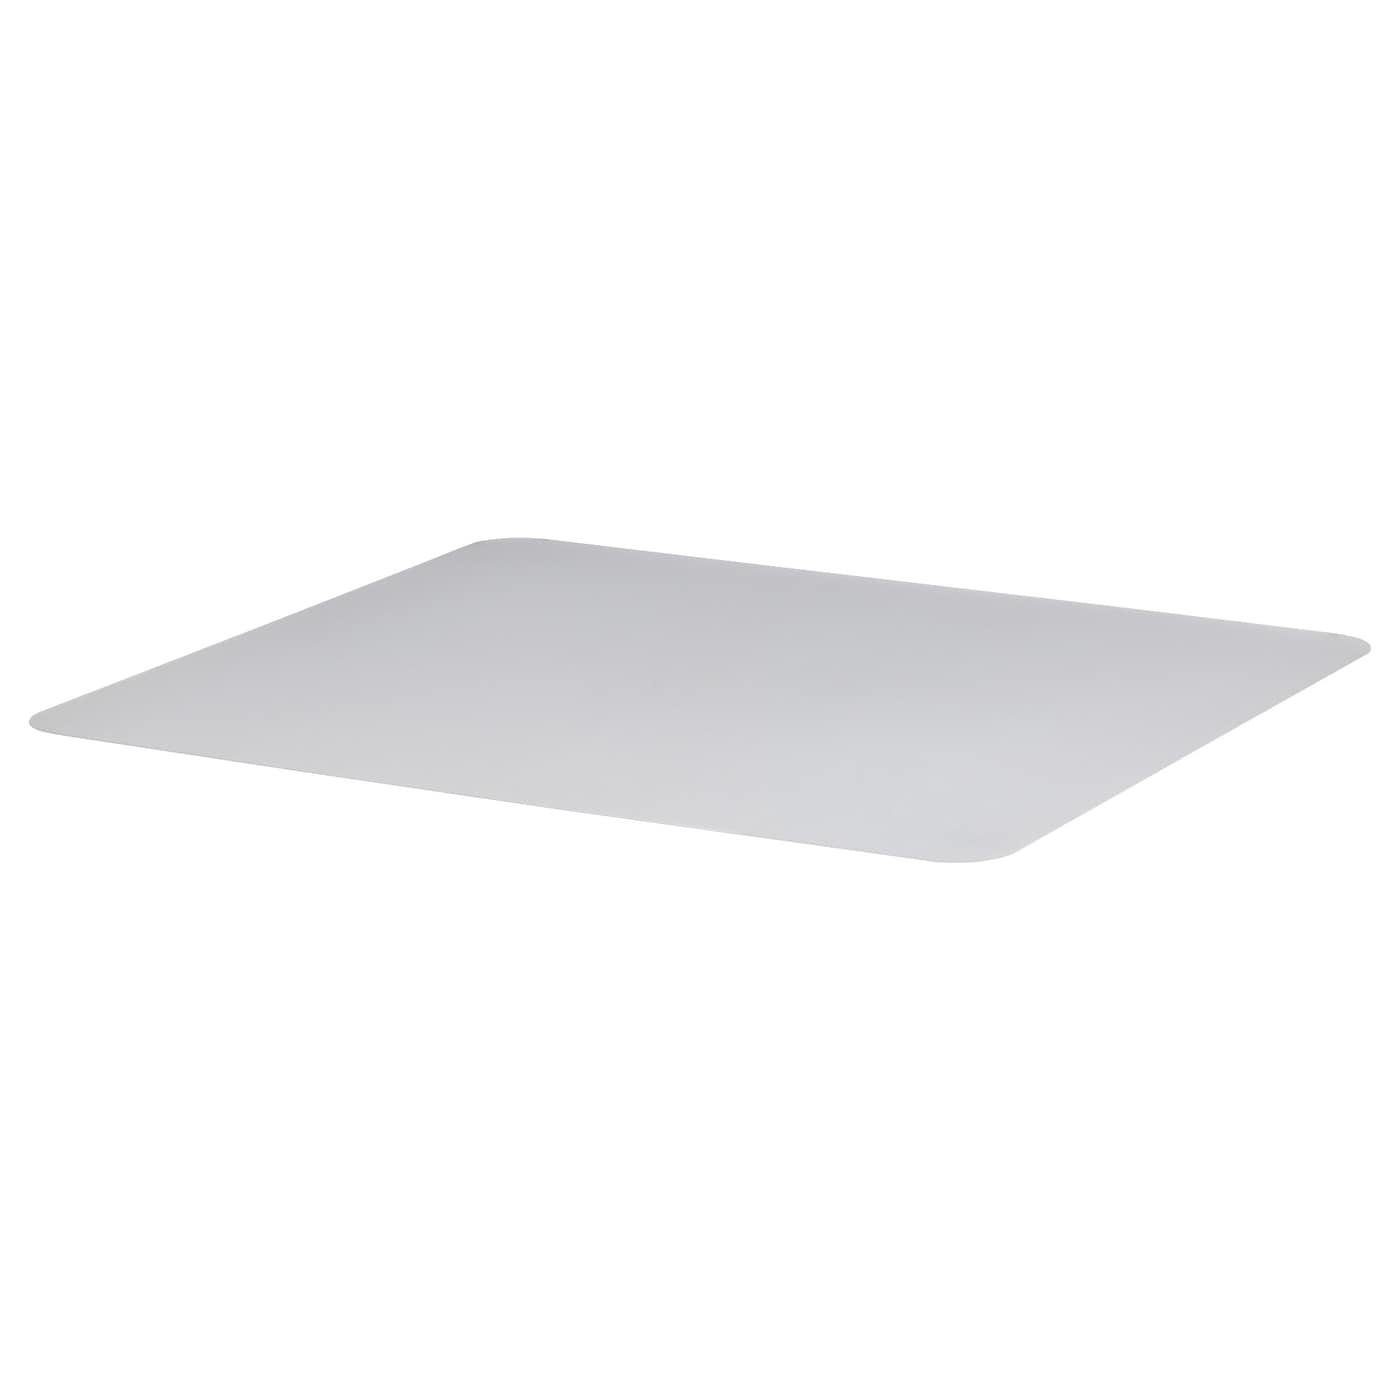 Kolon Floor Protector 47 1 4x39 3 8